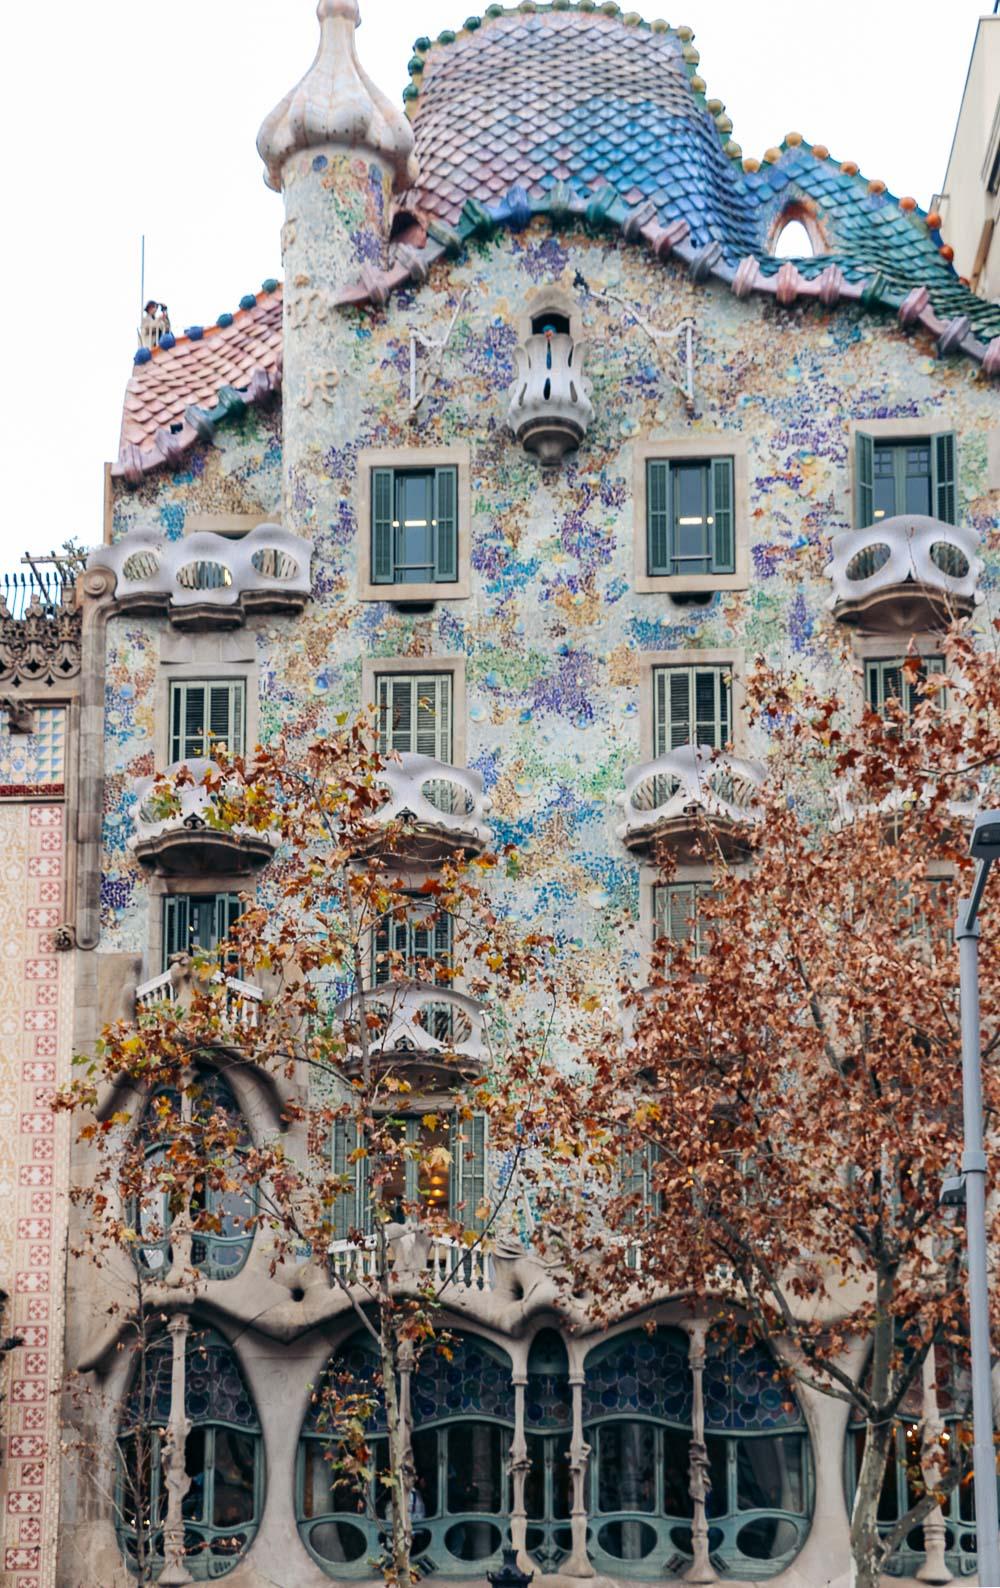 Barcelona Travel Guide - Roads and Destinations, roadsanddestinations.com